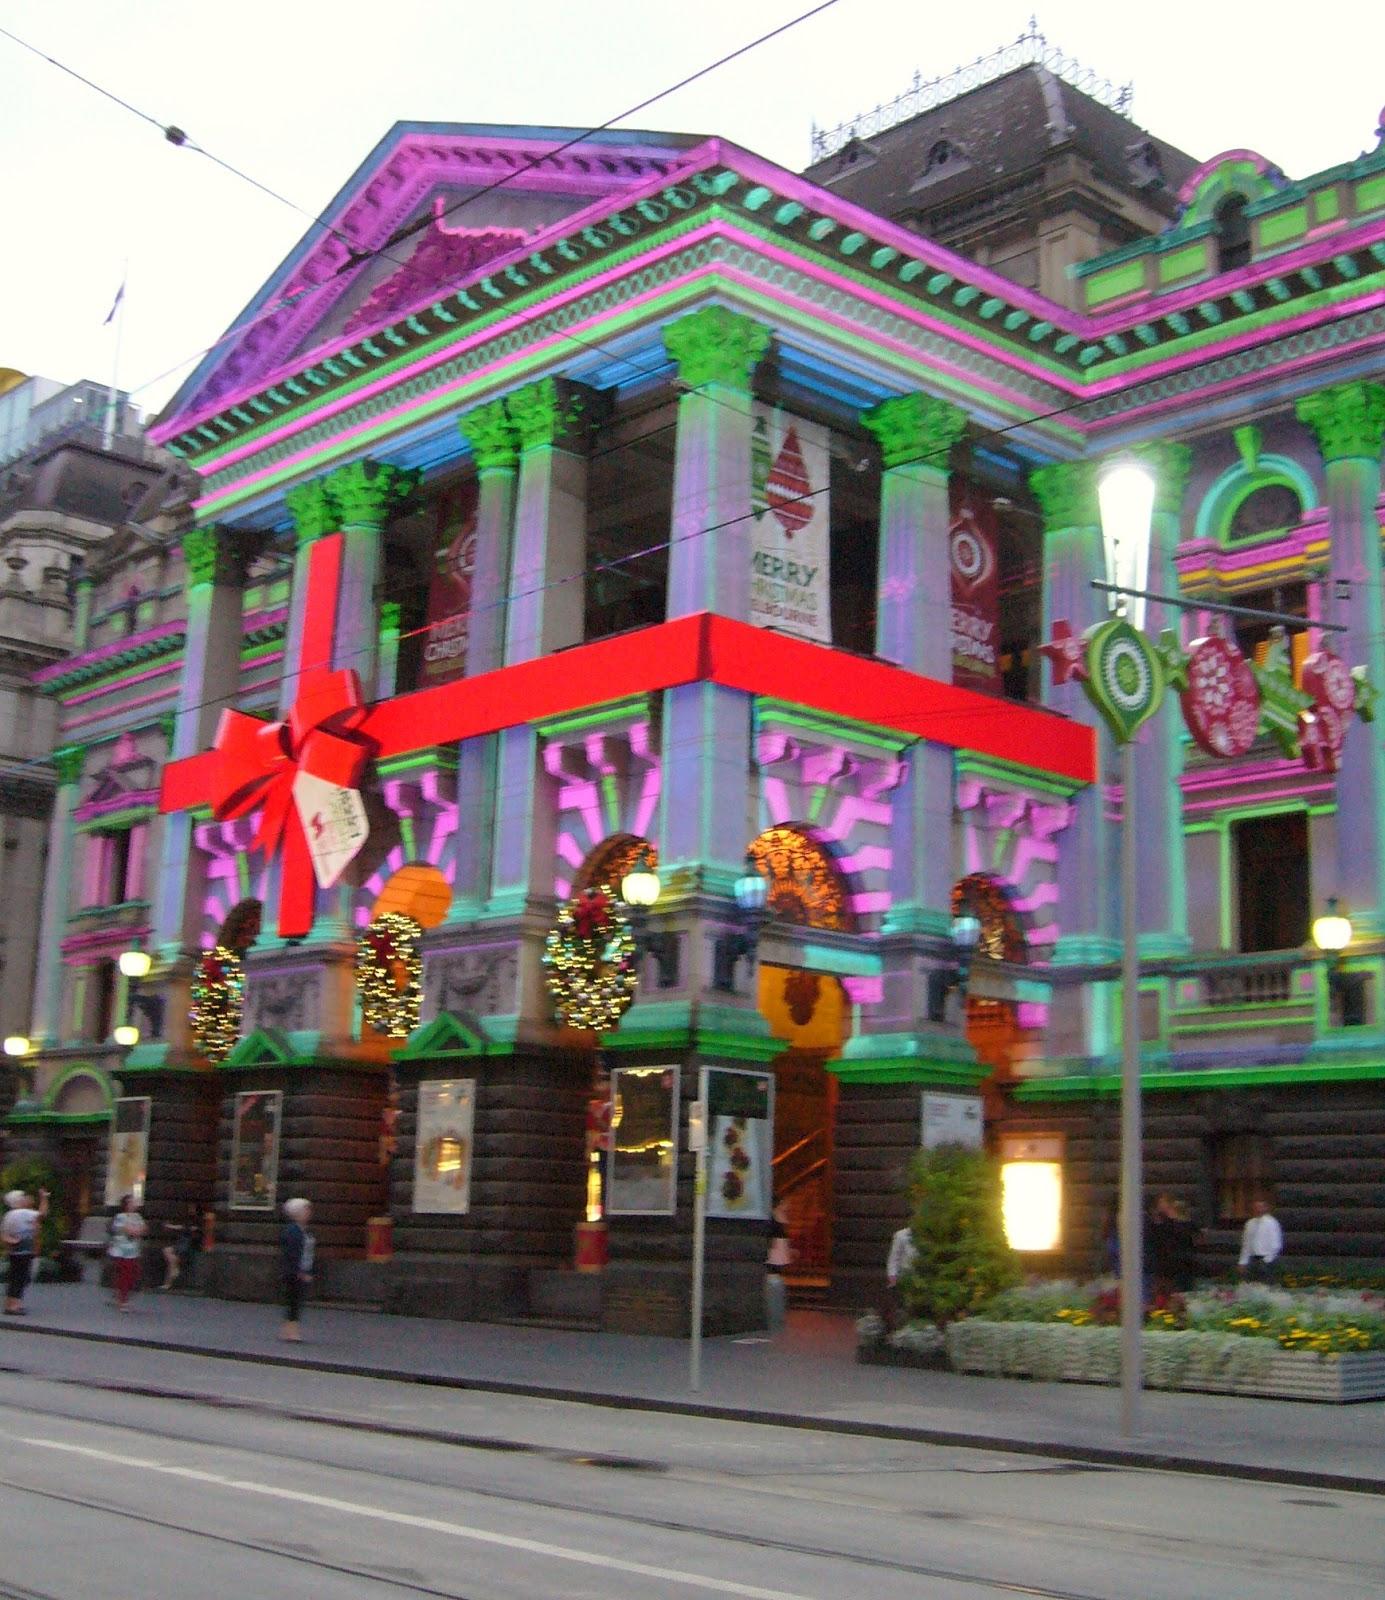 Christmas Trees Melbourne: Simple Simon Says: Melbourne